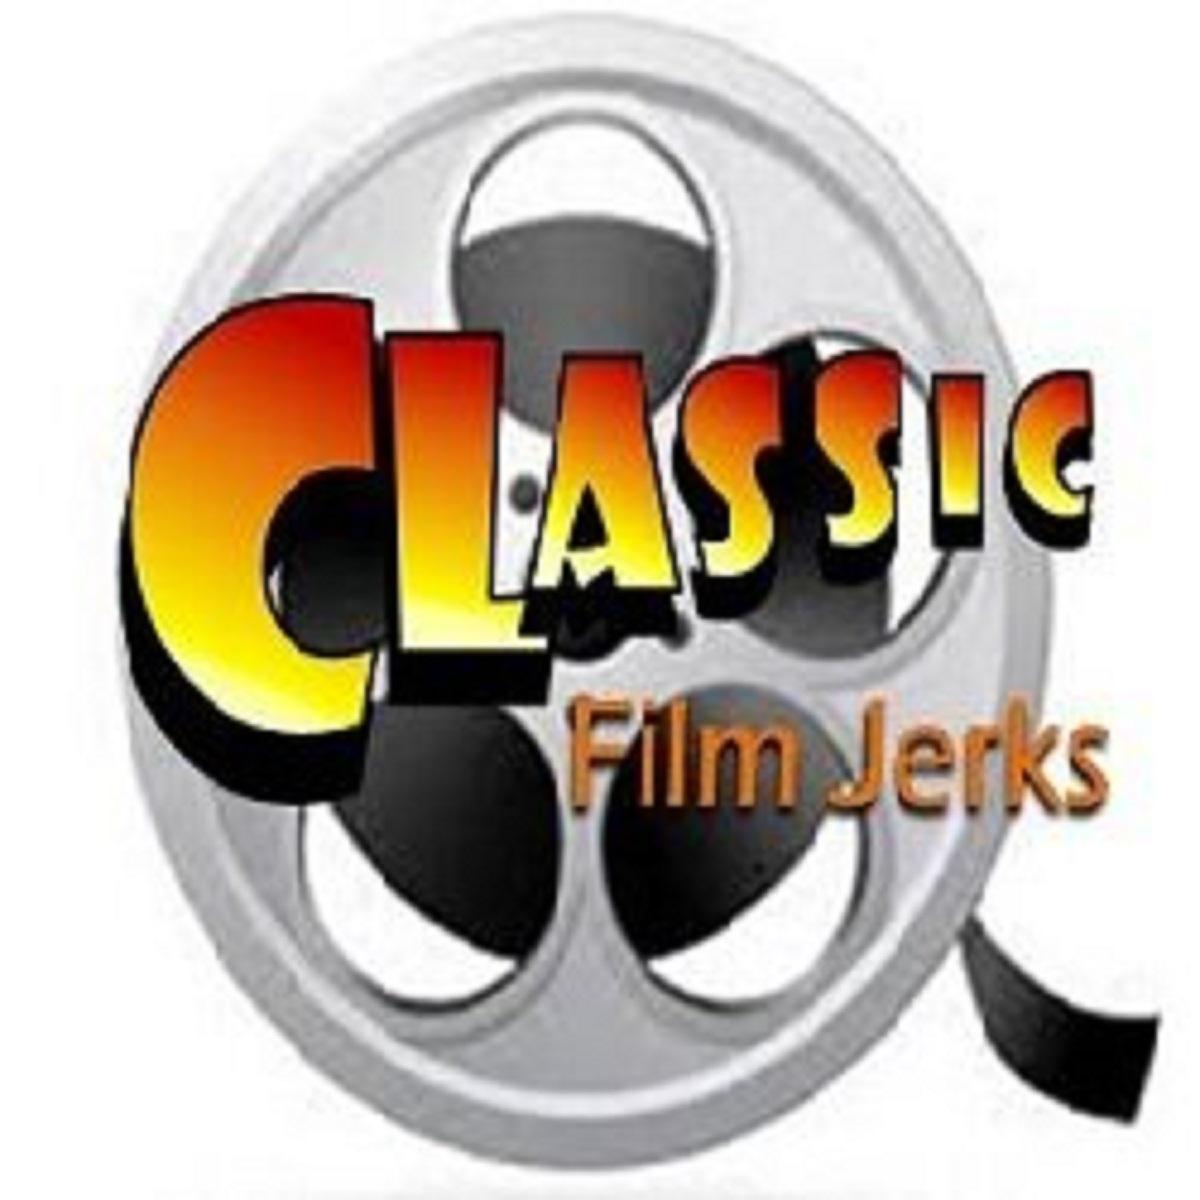 Classic Film Jerks